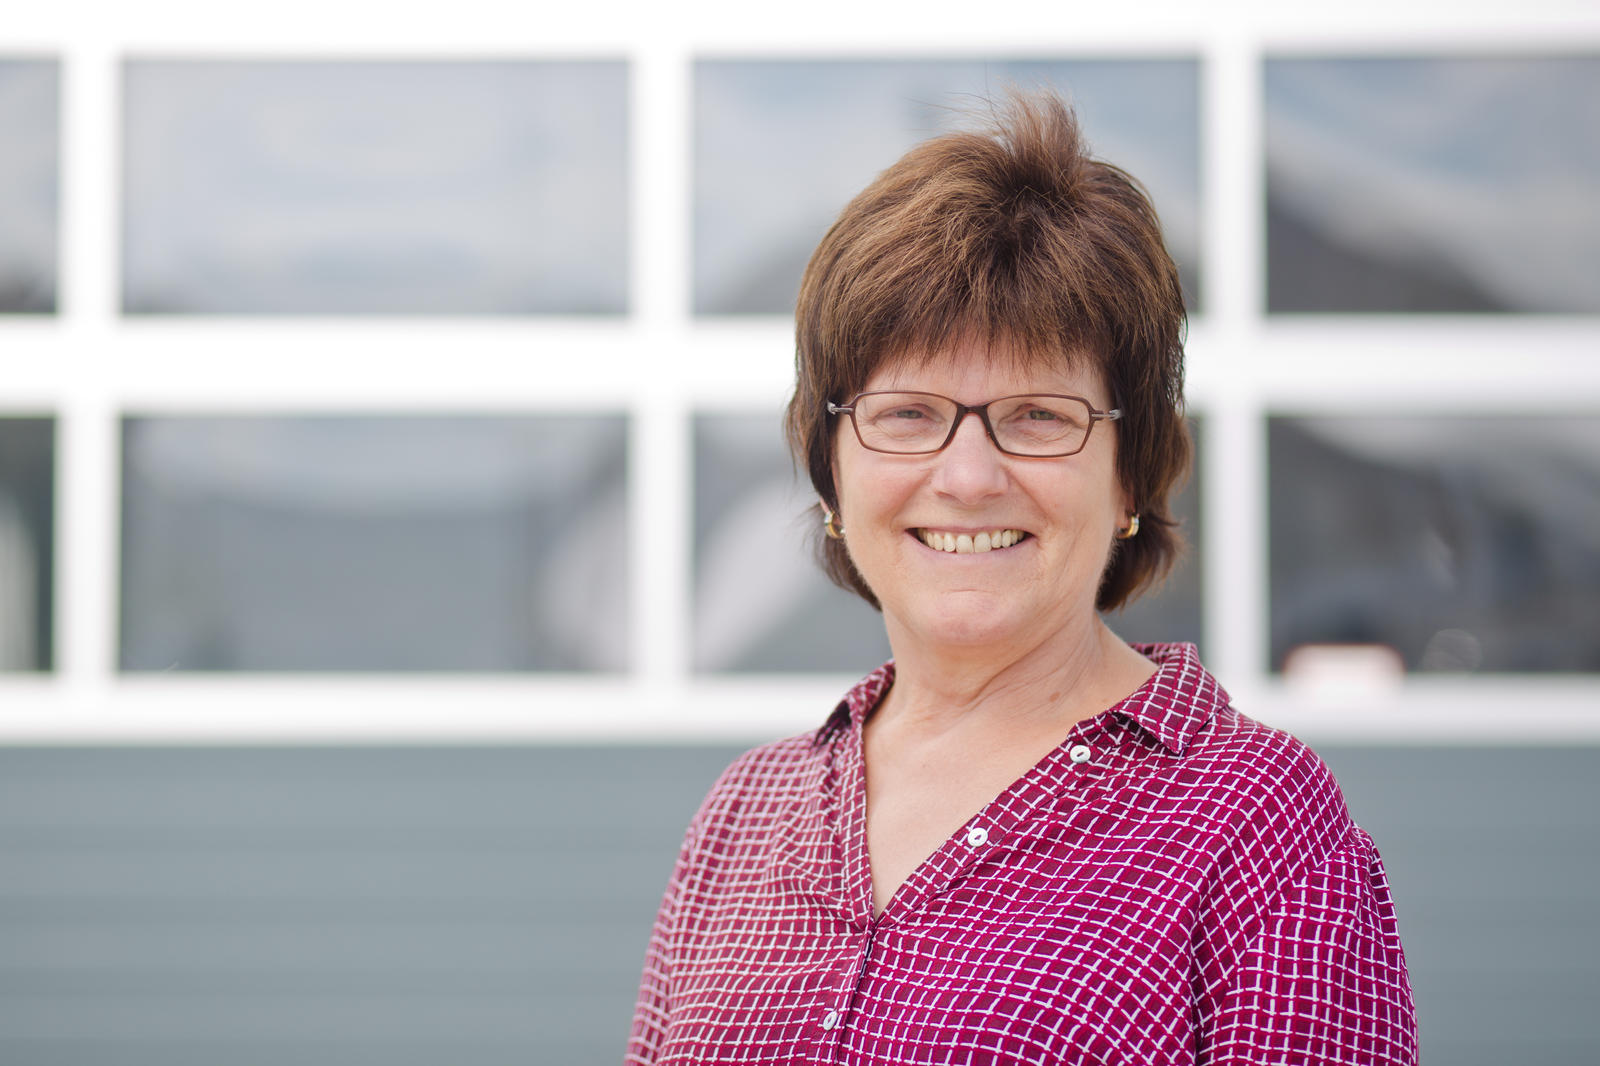 Hannelore Brinkmann